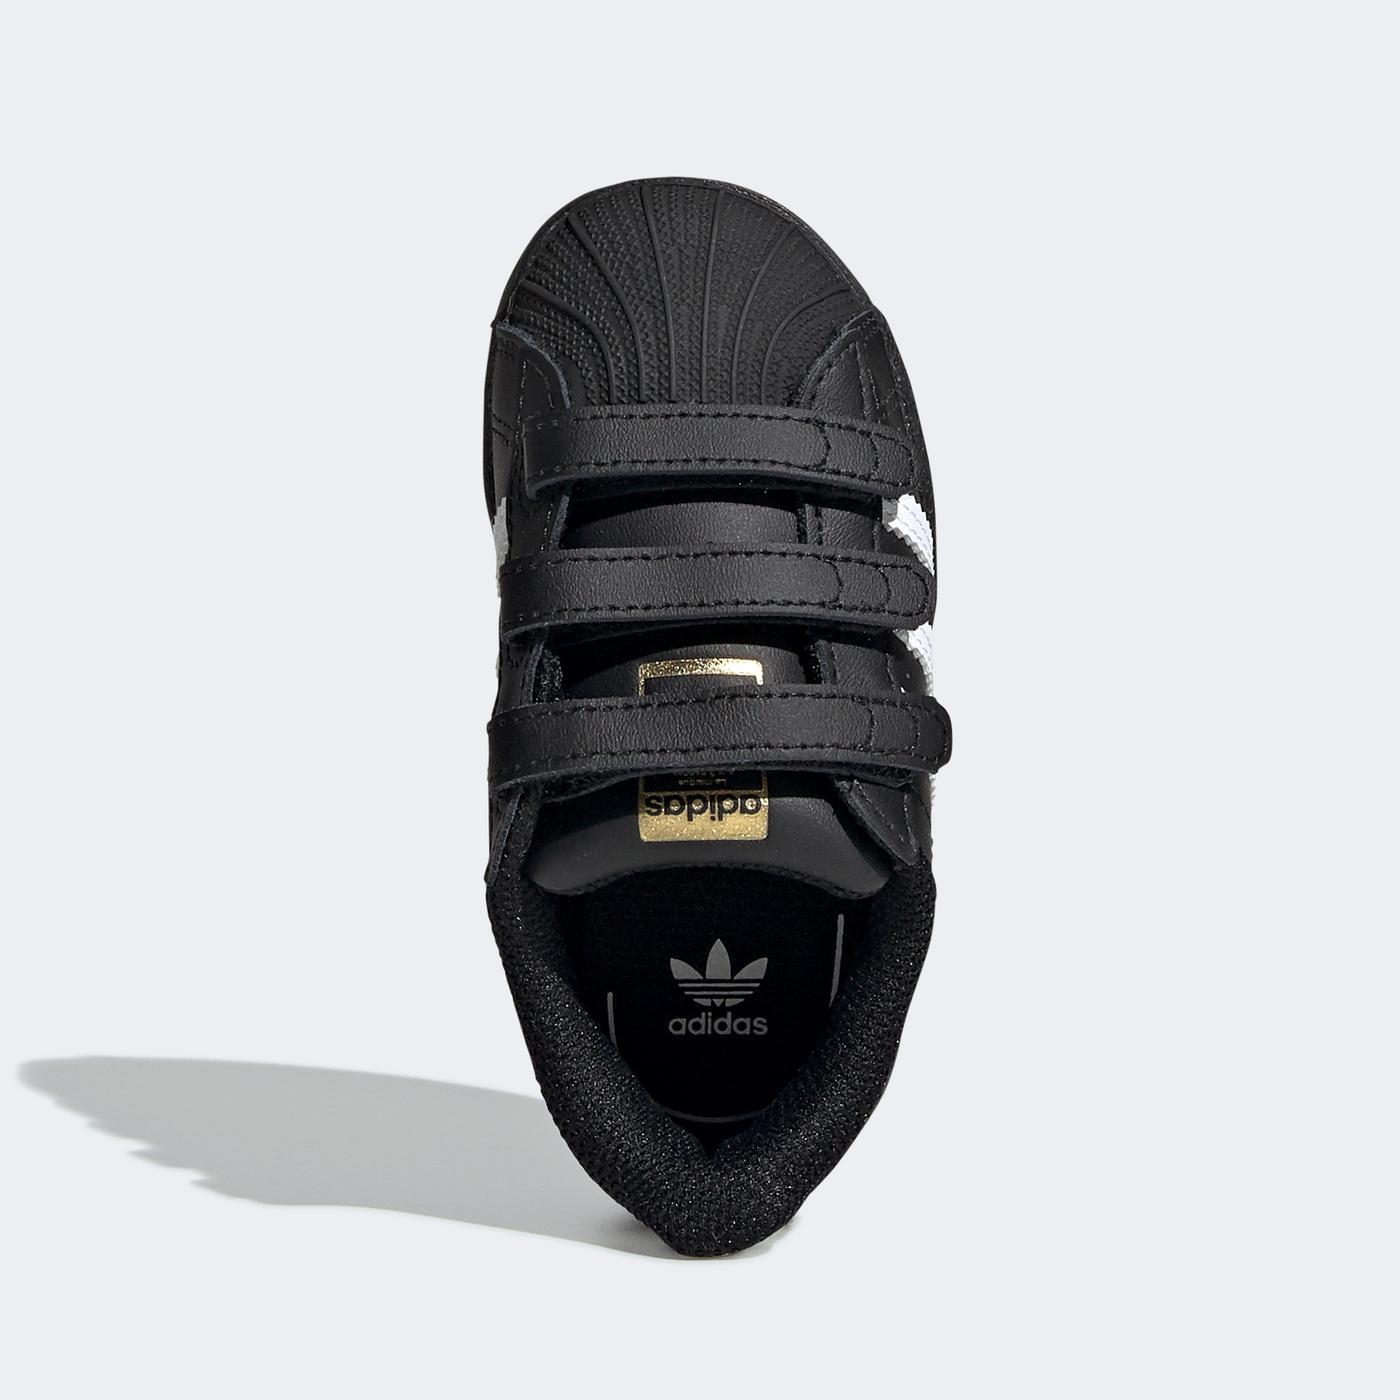 adidas Superstar Bebek Siyah Spor Ayakkabı